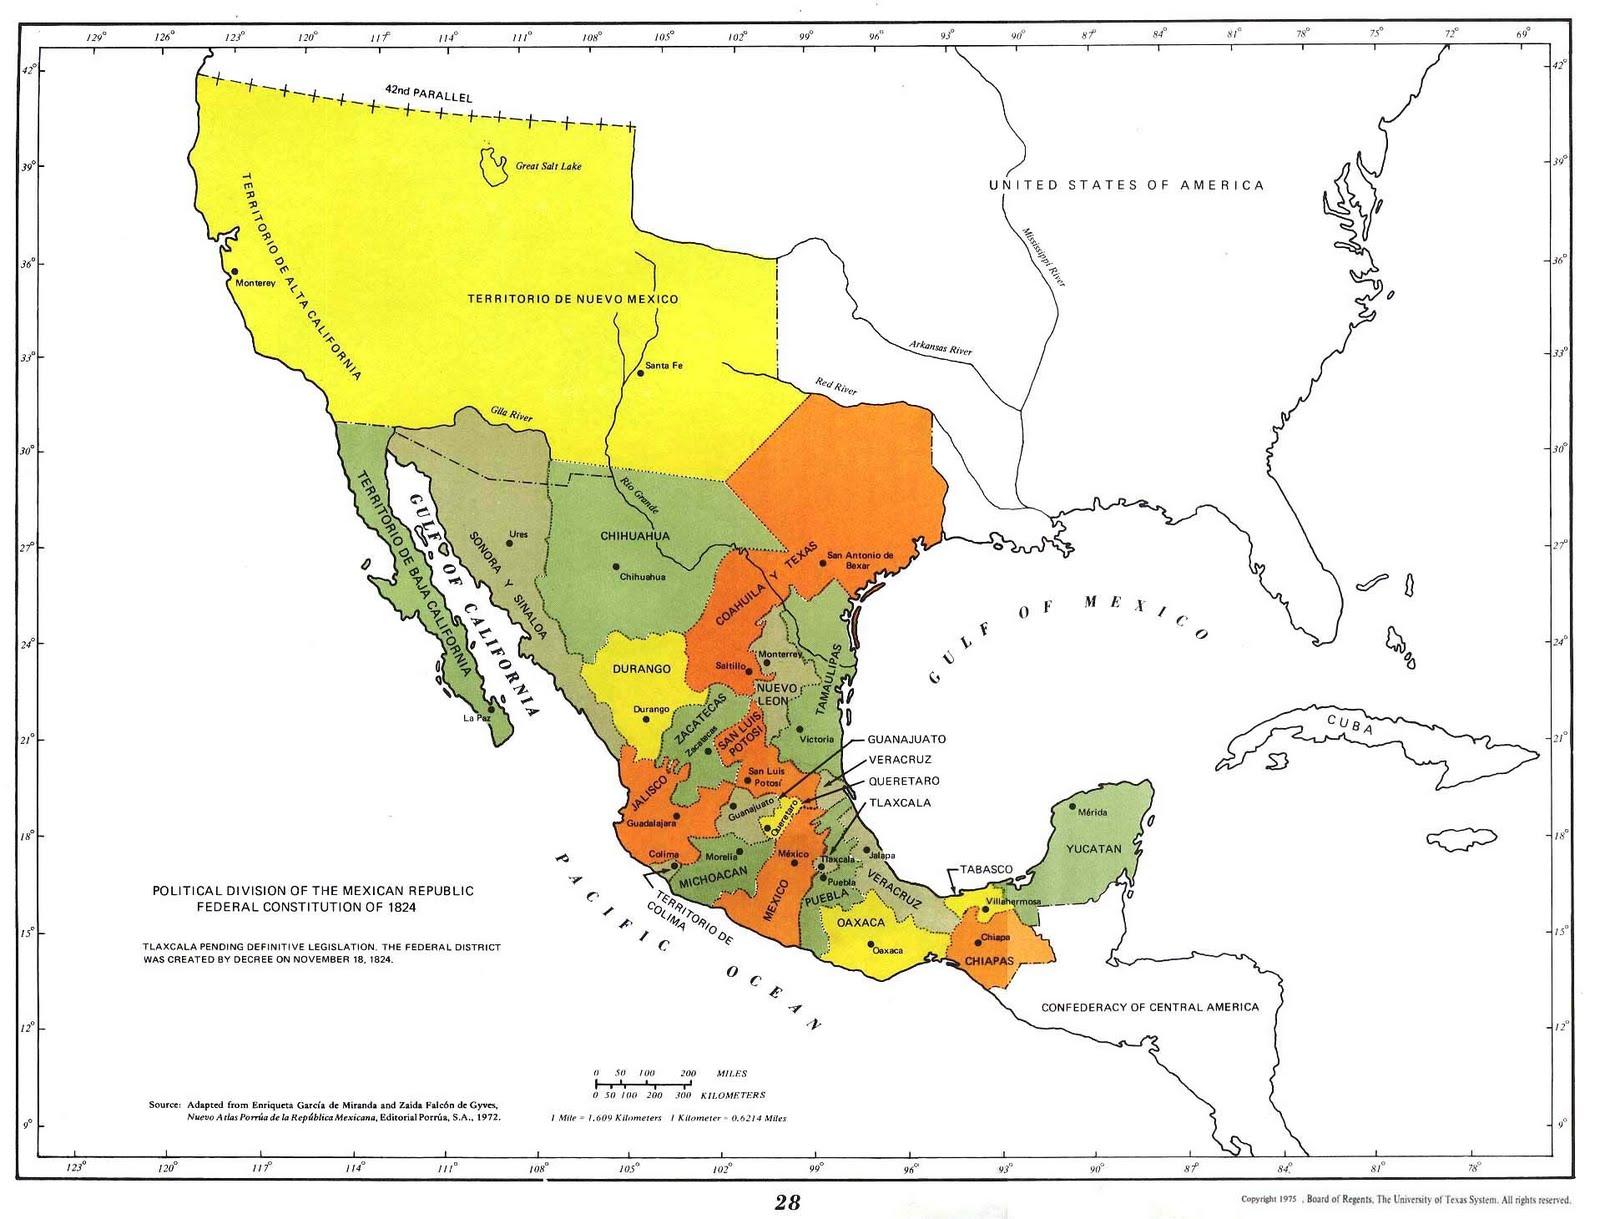 Pz C Mapa De Mexico